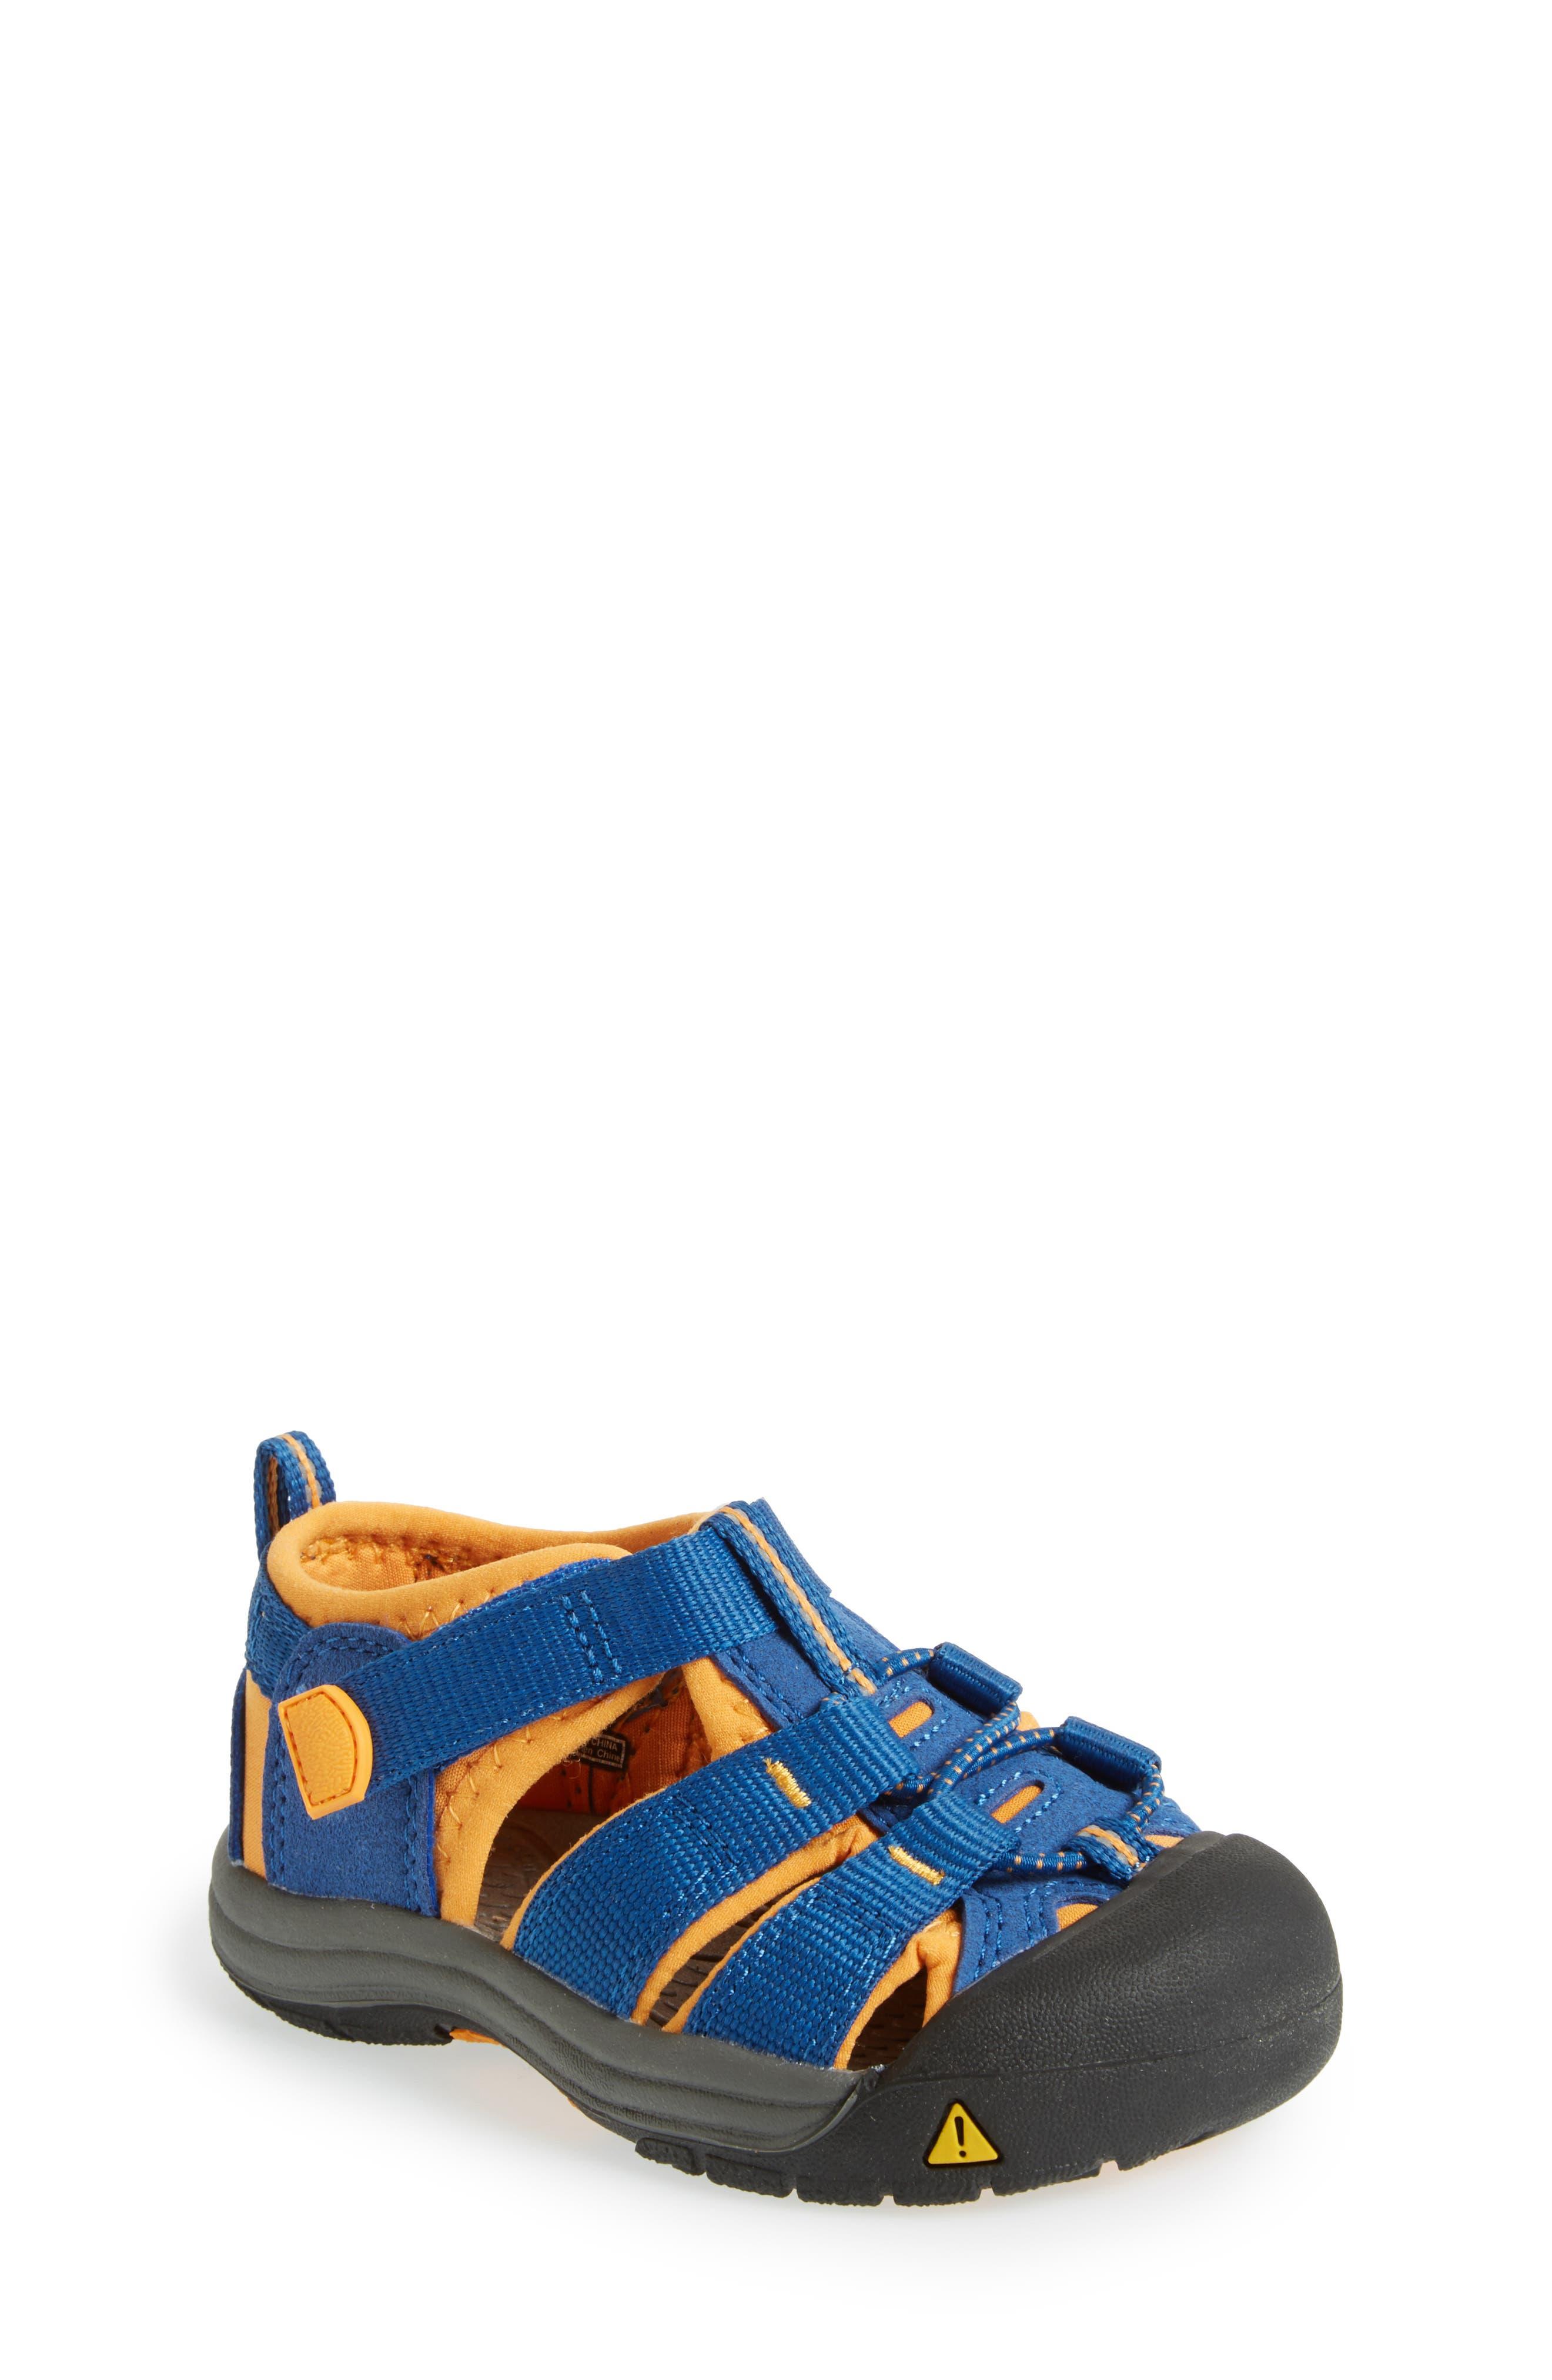 'Newport H2' Water Friendly Sandal,                             Main thumbnail 35, color,